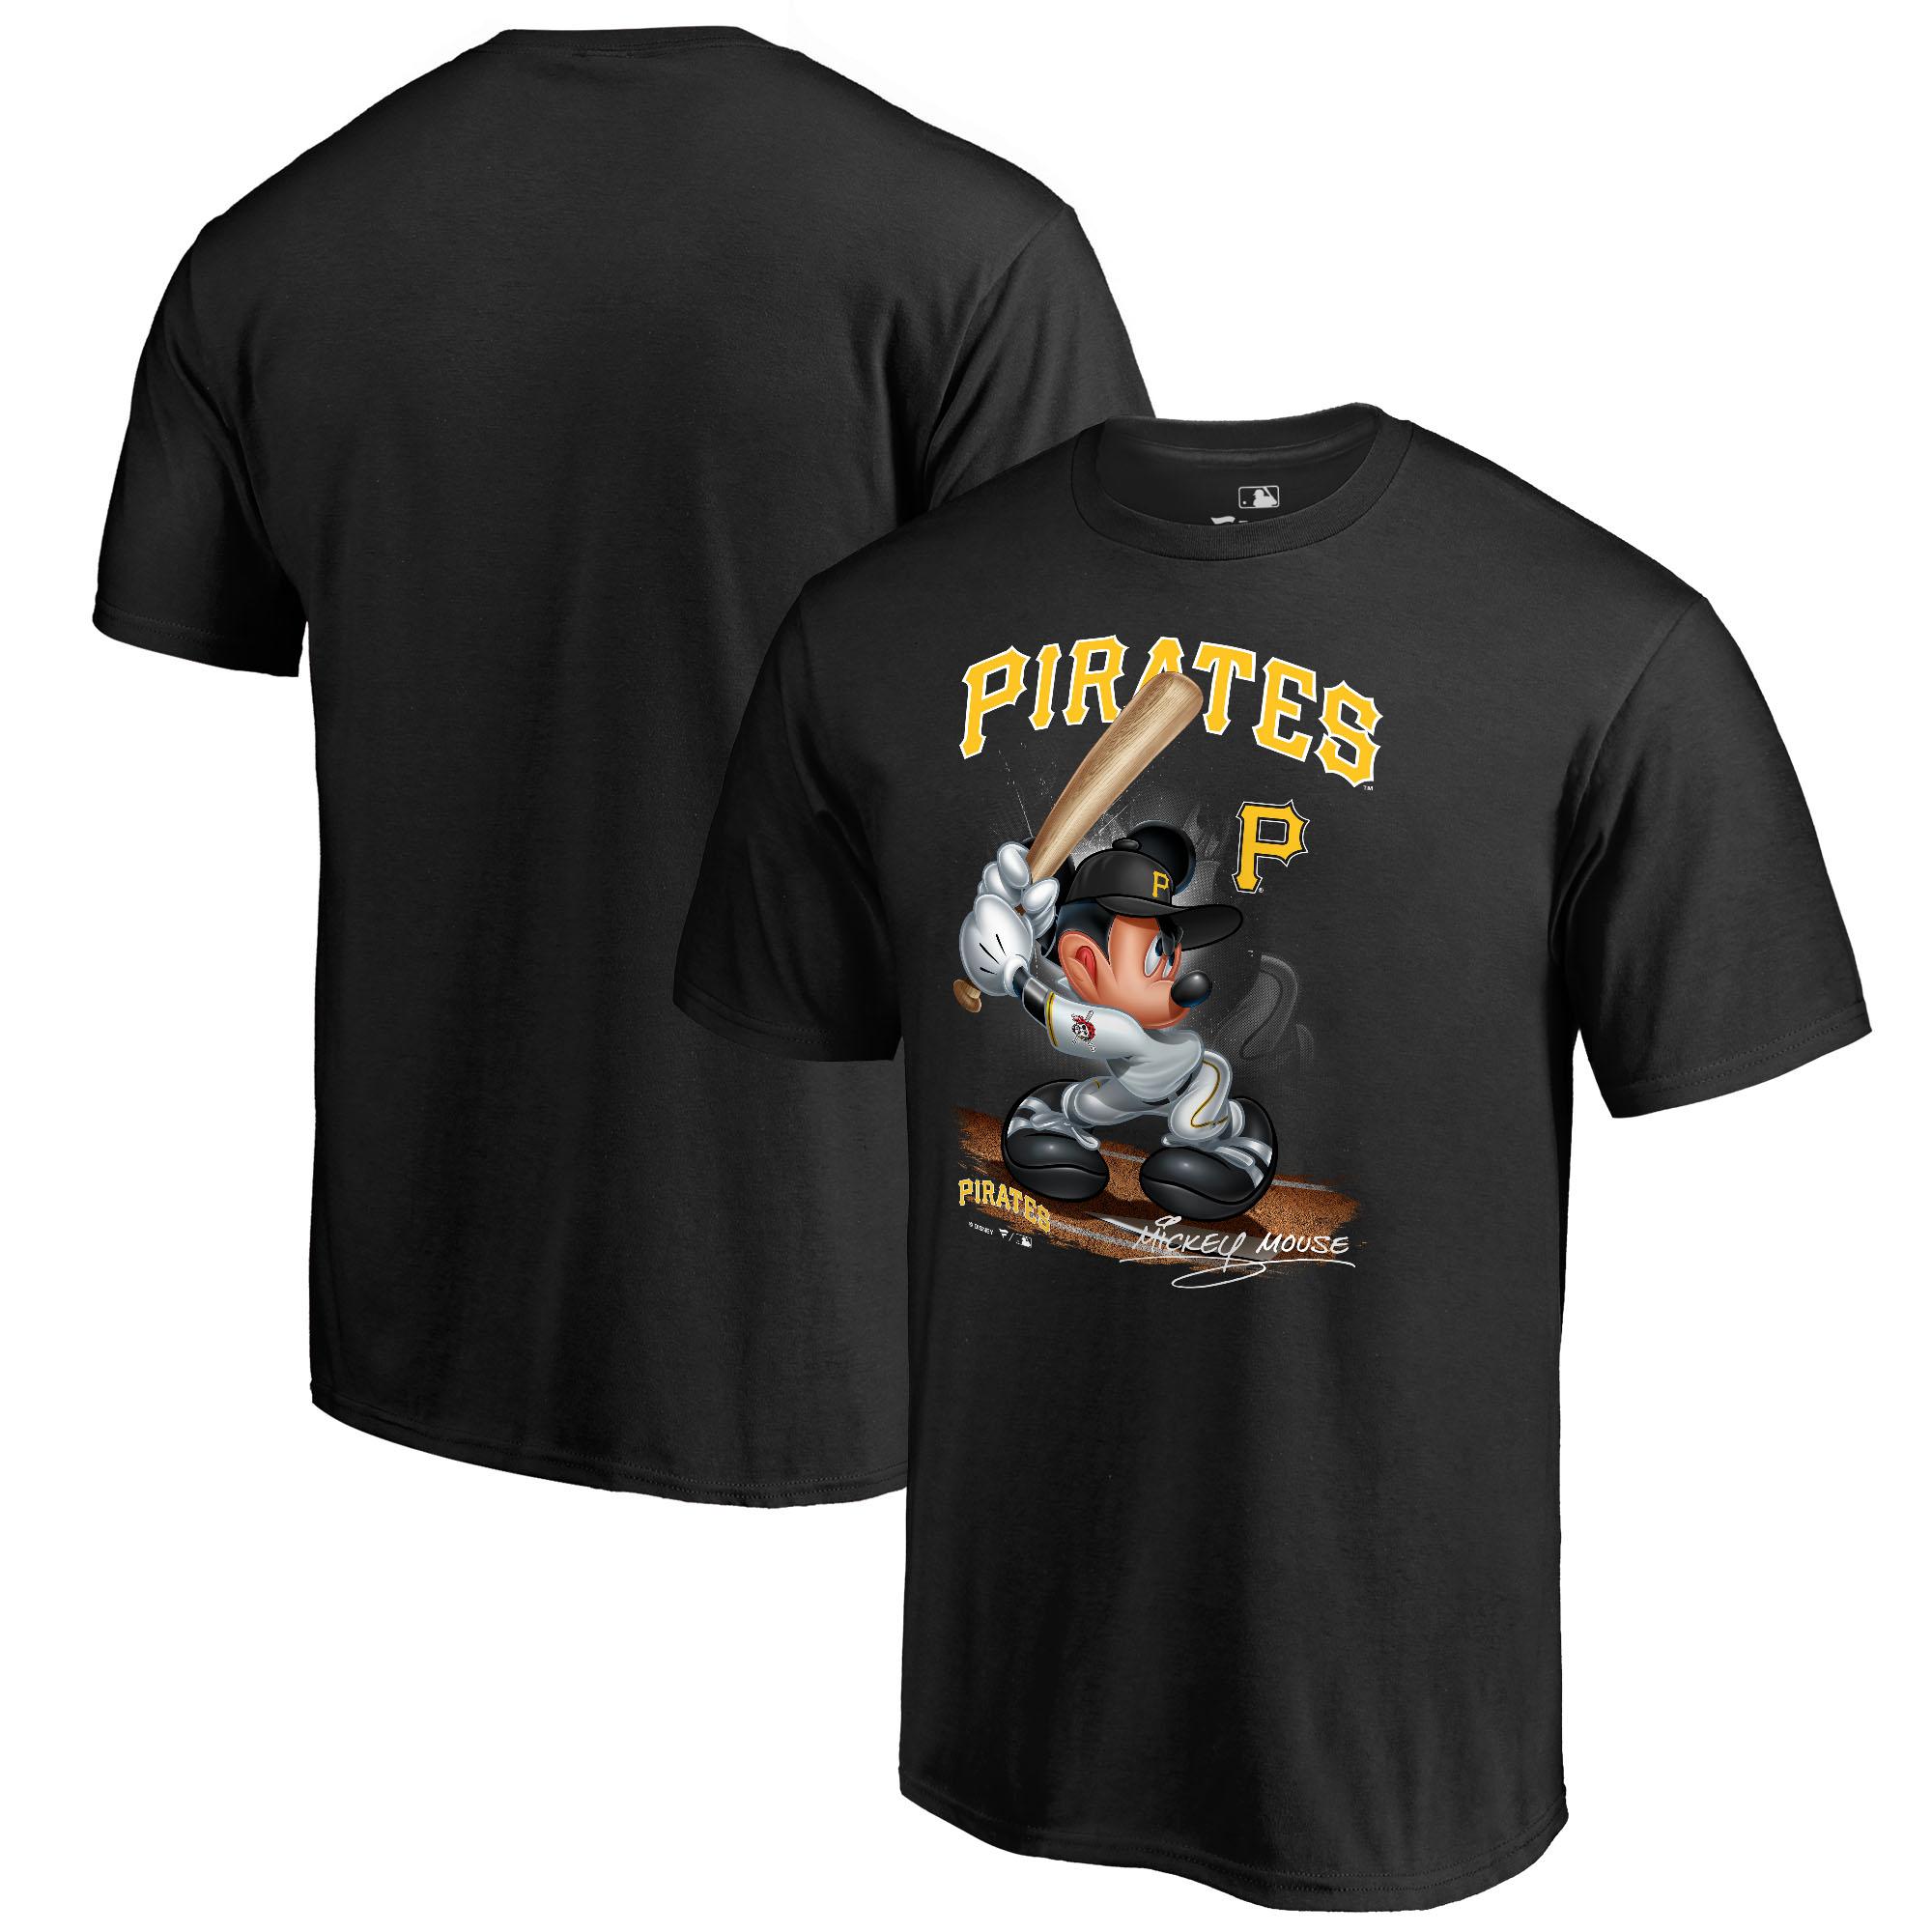 Pittsburgh Pirates Fanatics Branded Disney All Star T-Shirt - Black